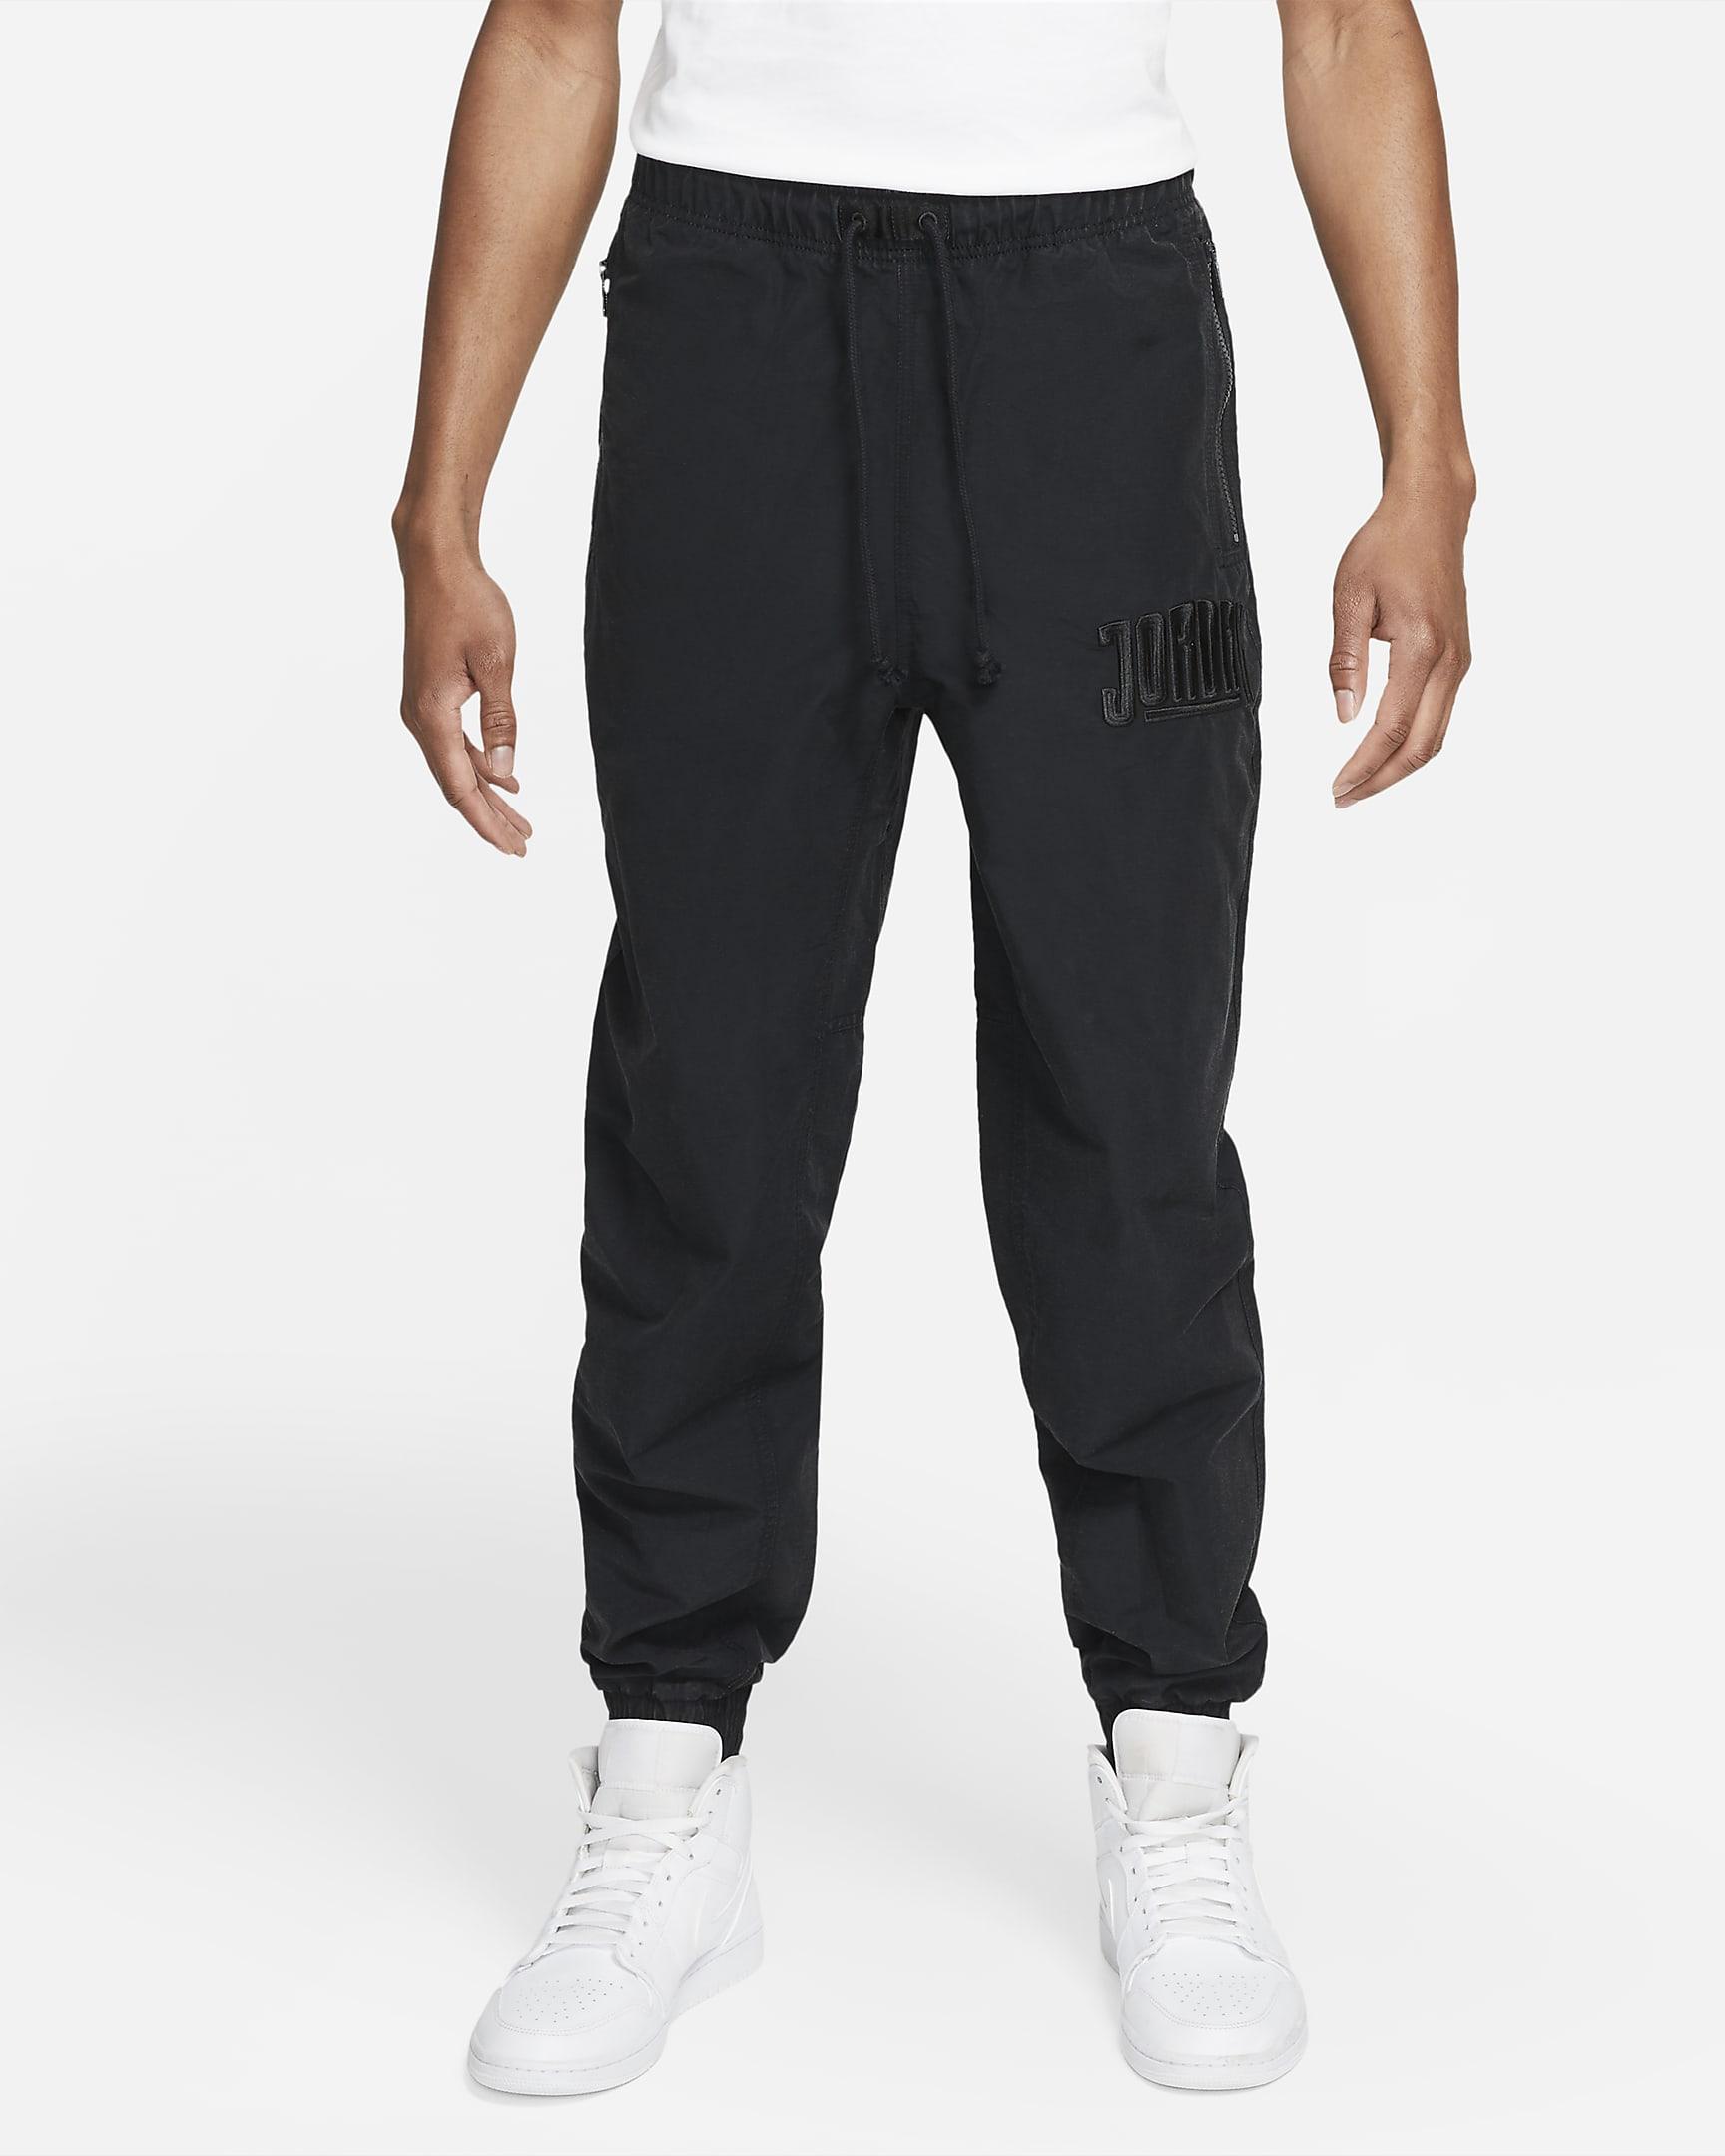 jordan-sport-dna-mens-woven-pants-GM7sk2.png